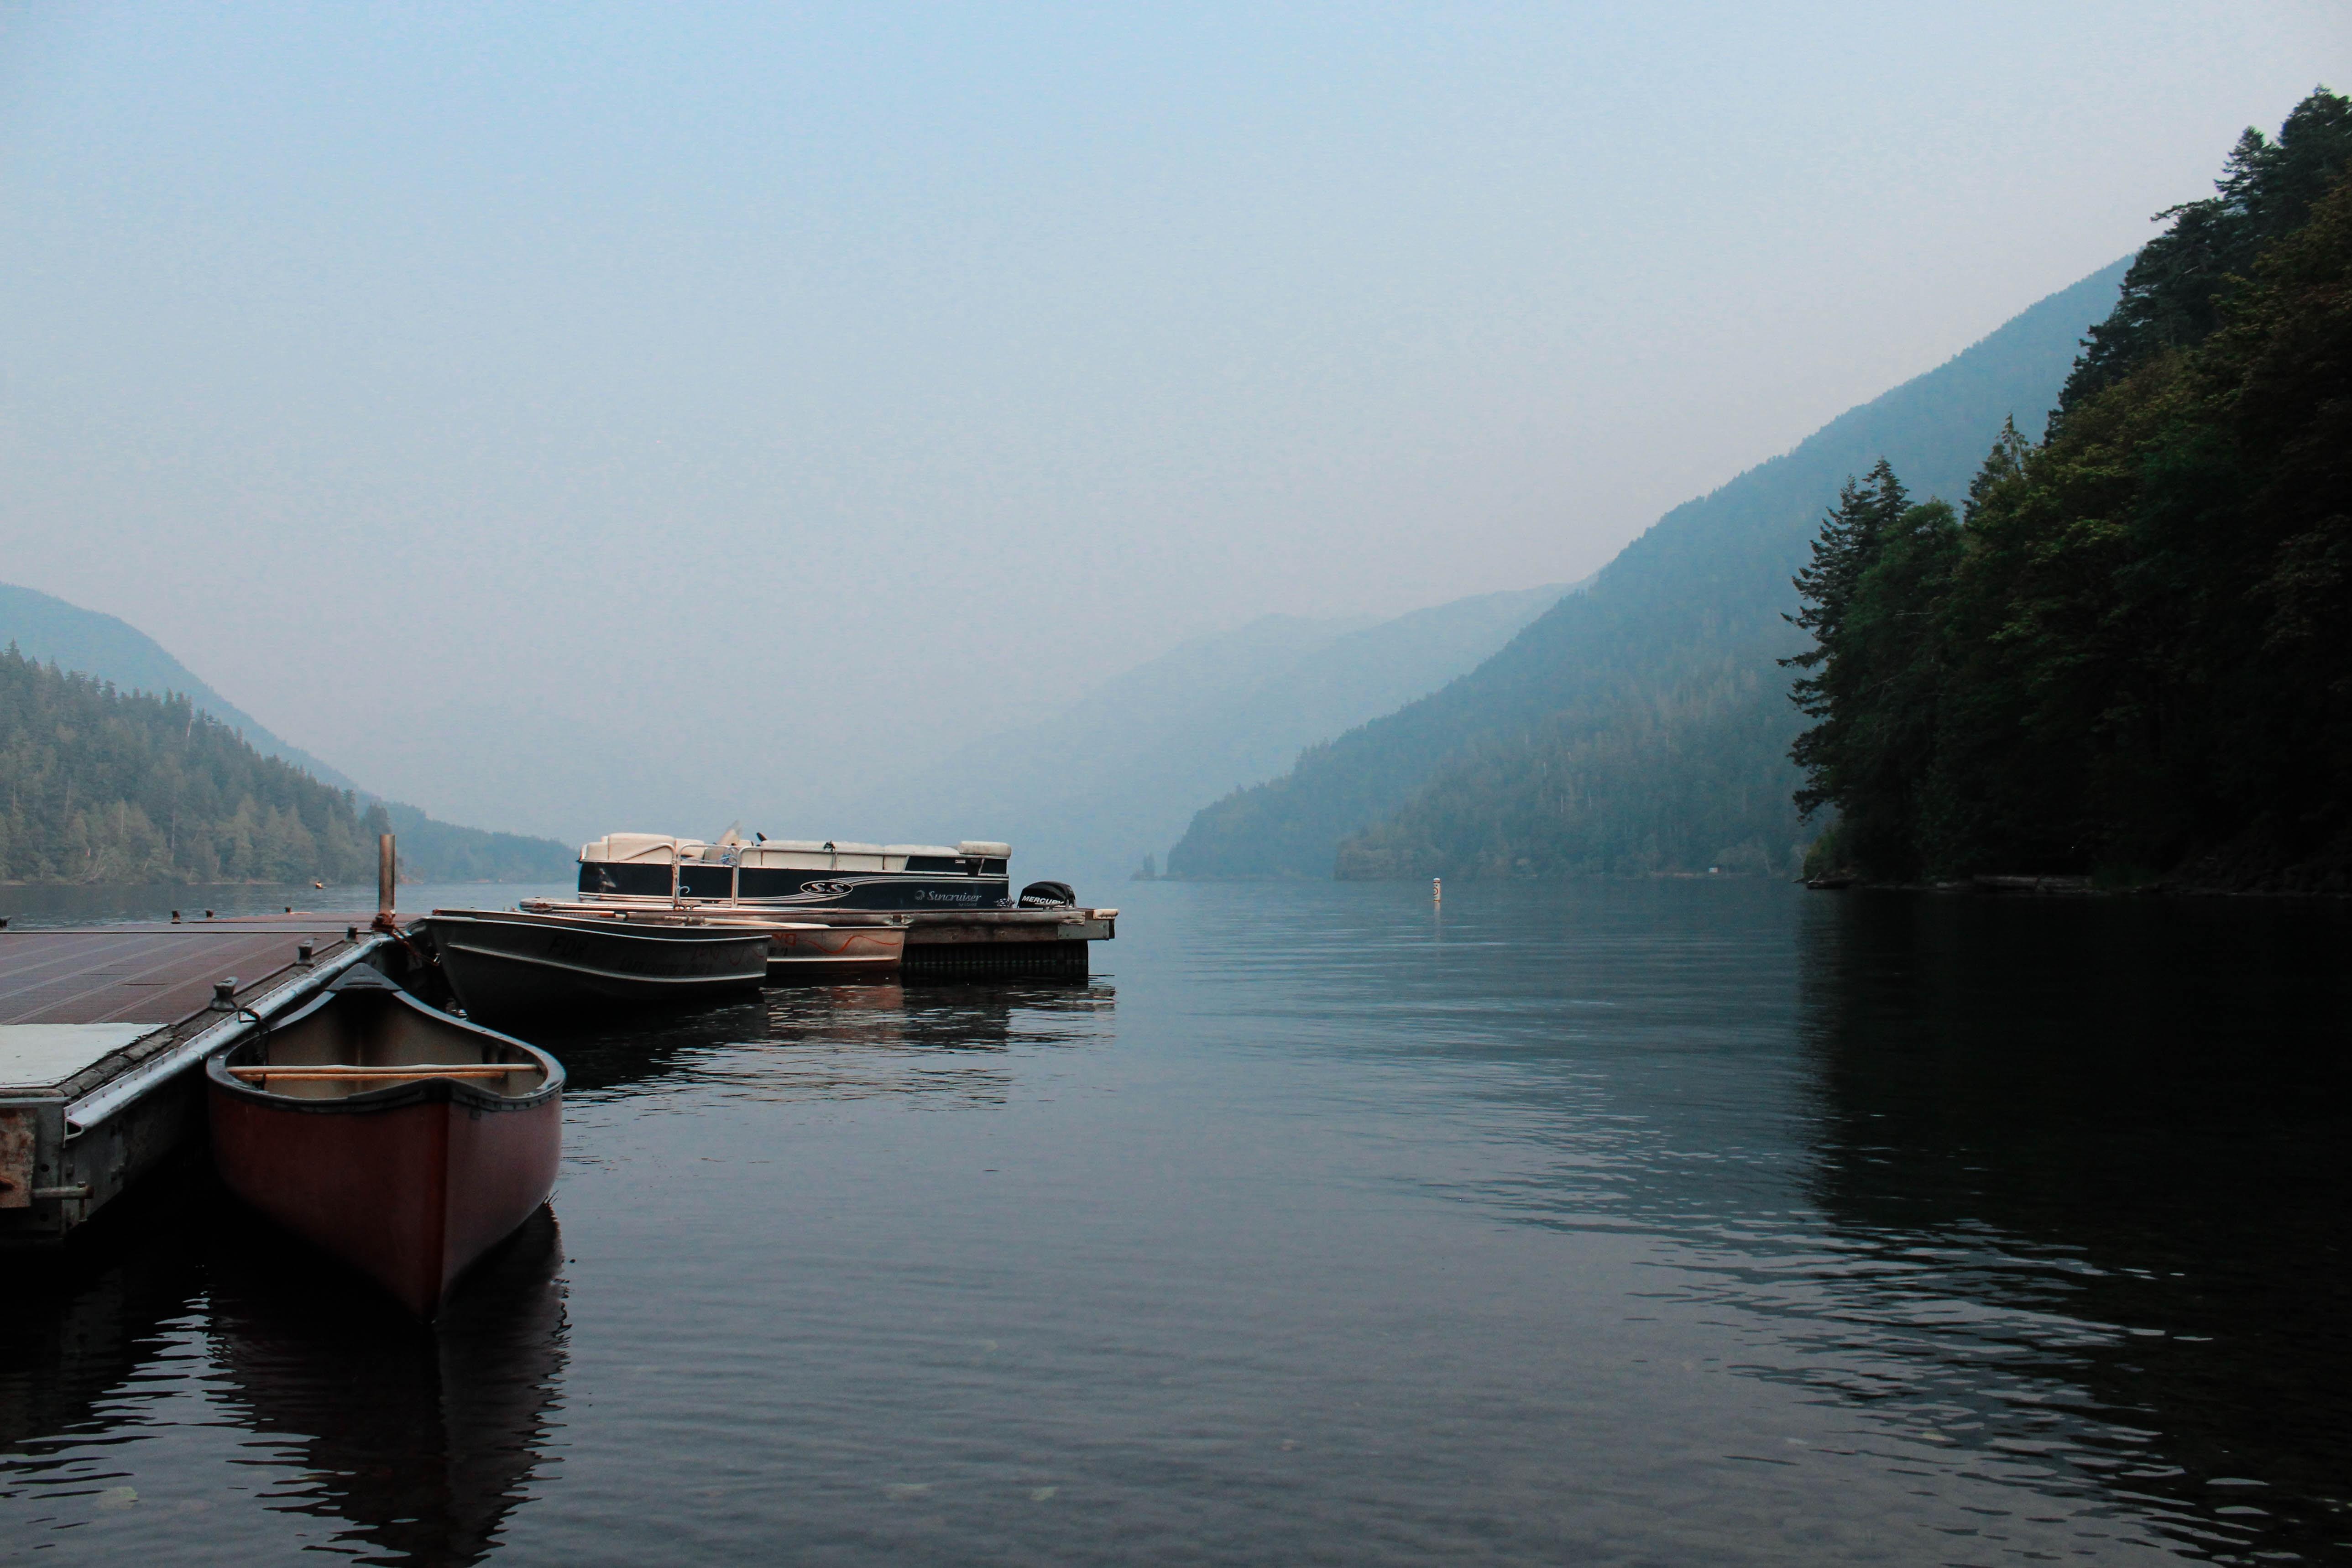 brown canoe docked under blue sky